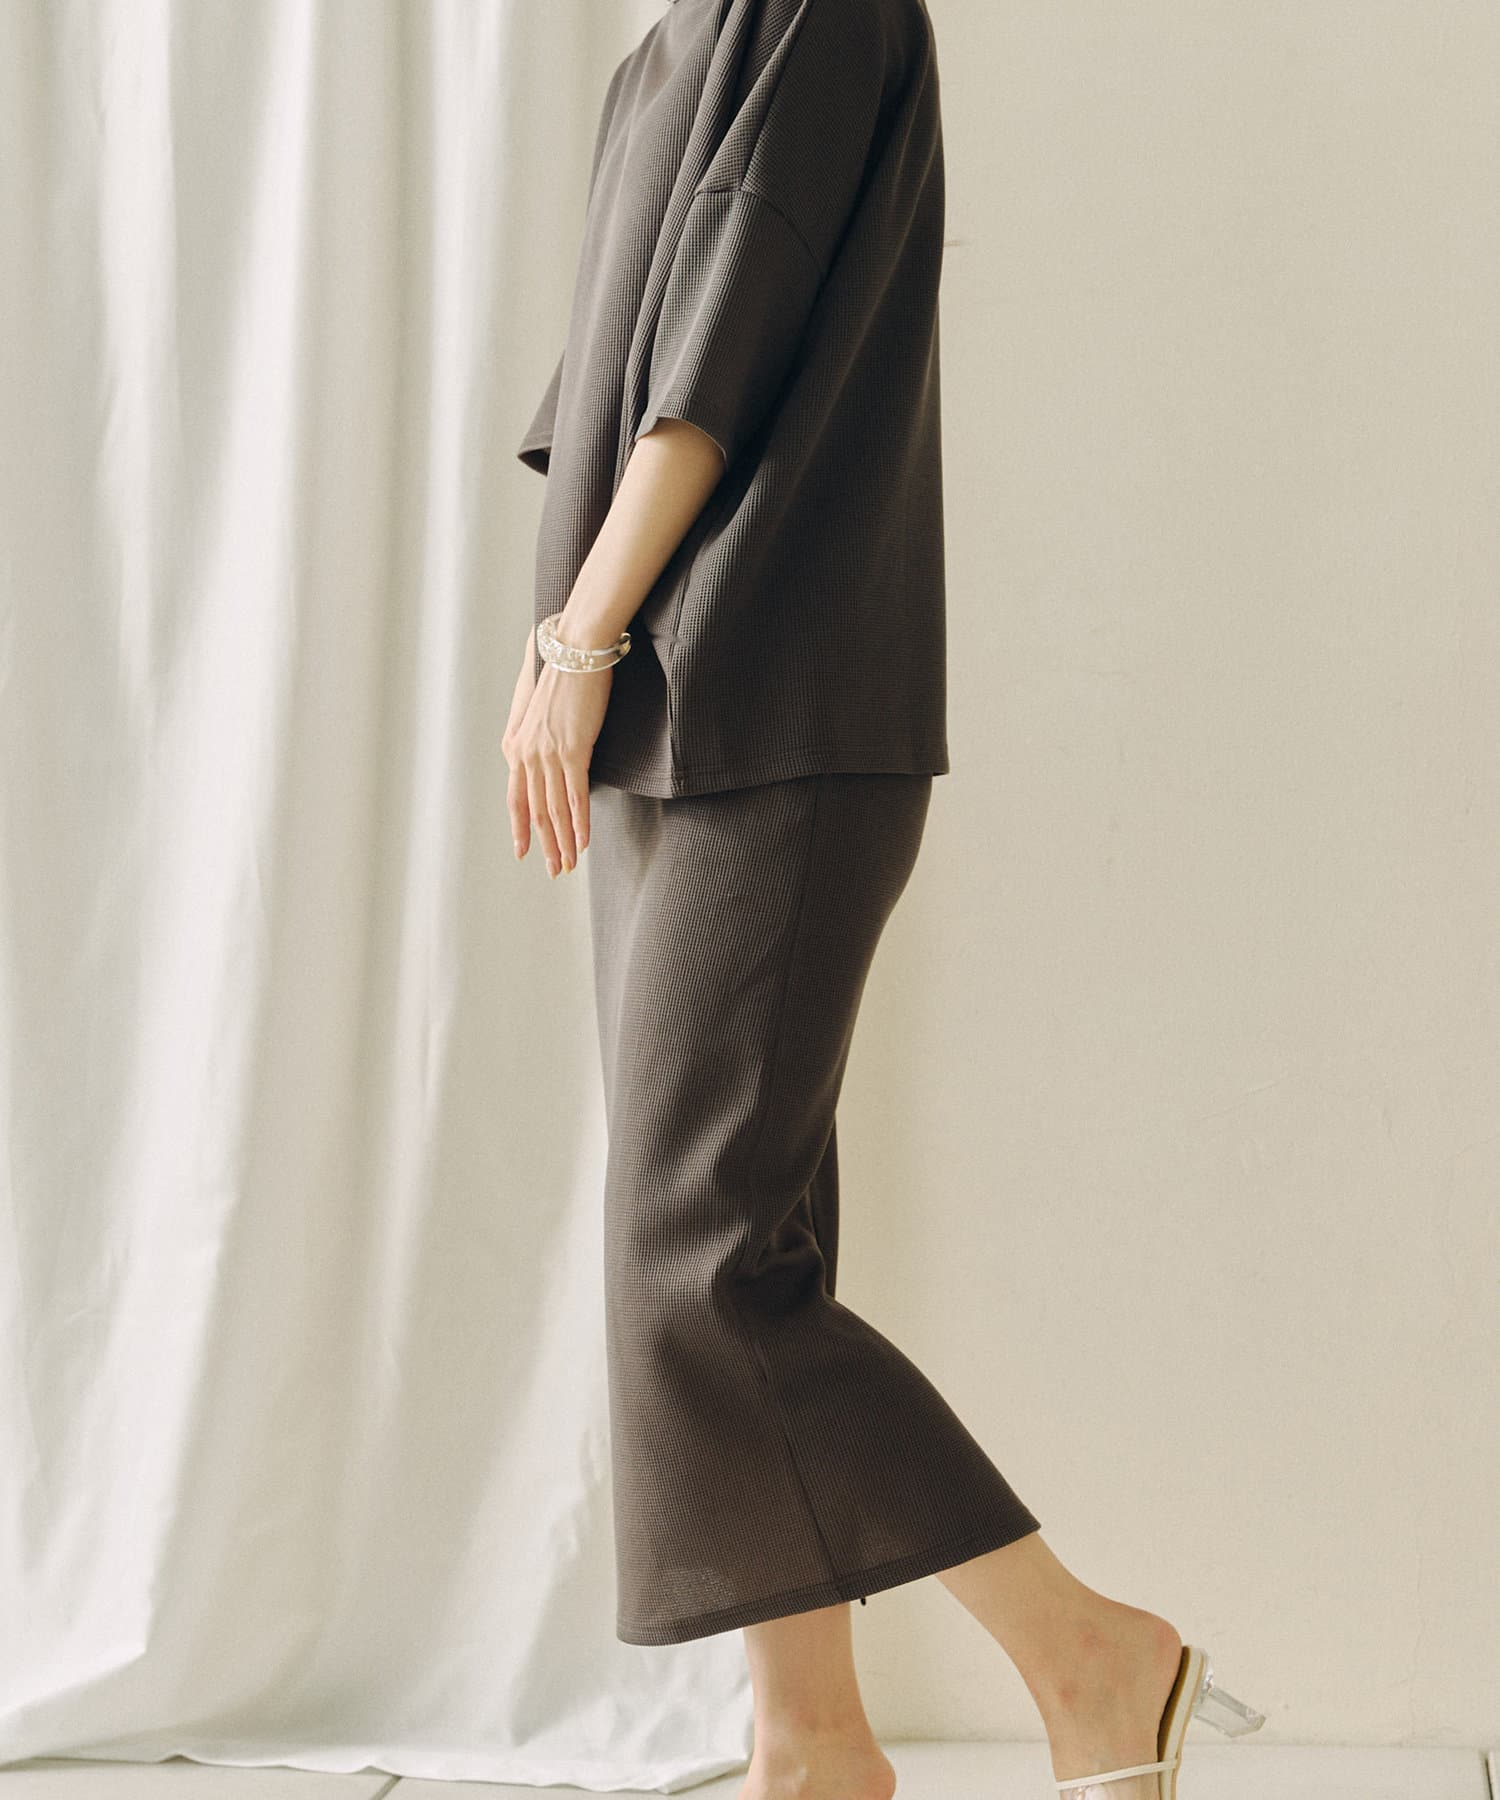 Chez toi(シェトワ) 【着用動画あり】上下セット サーマルカットプルオーバー×スカート